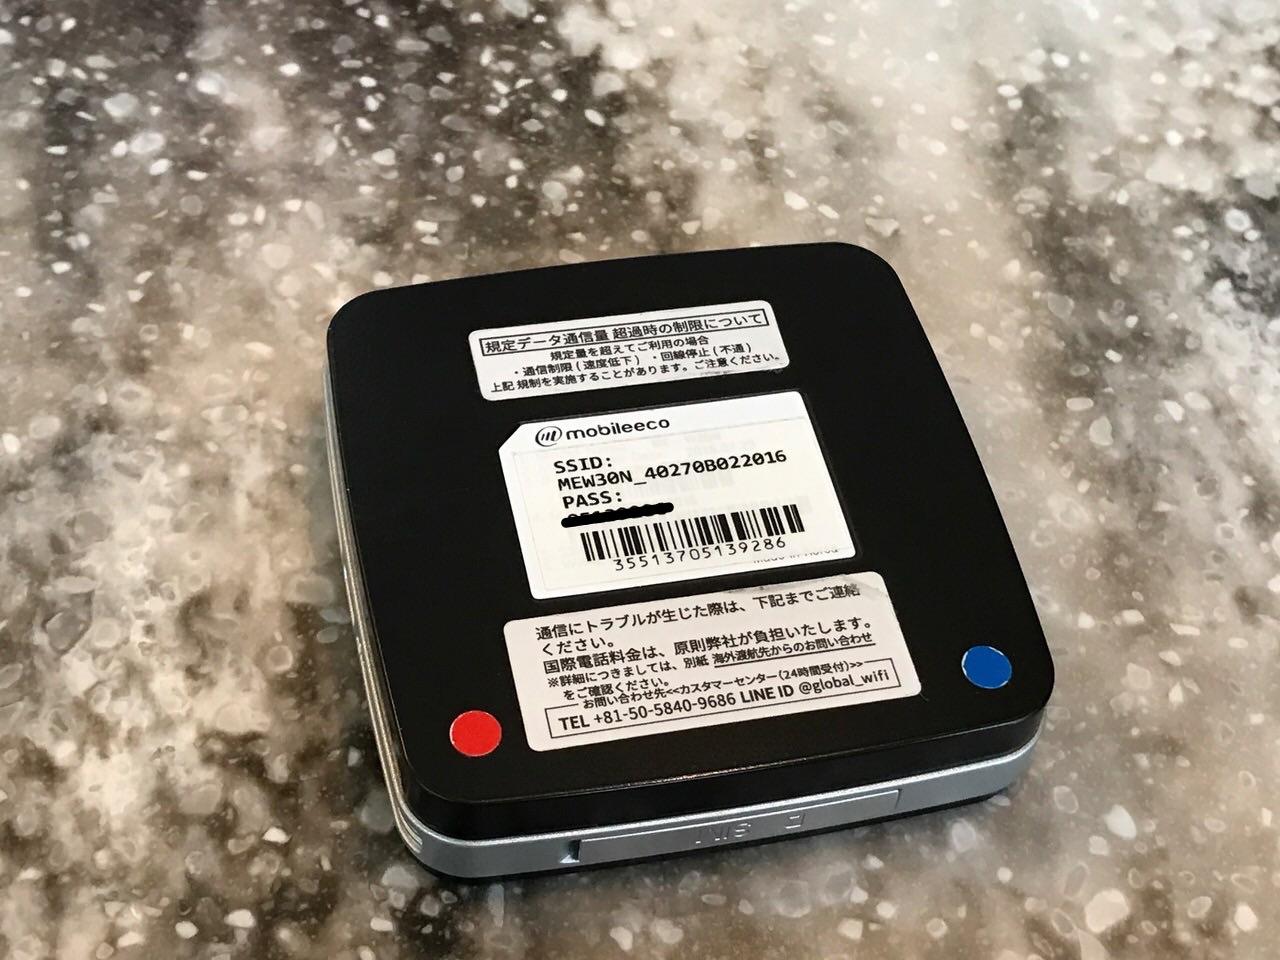 Global wifi 0110